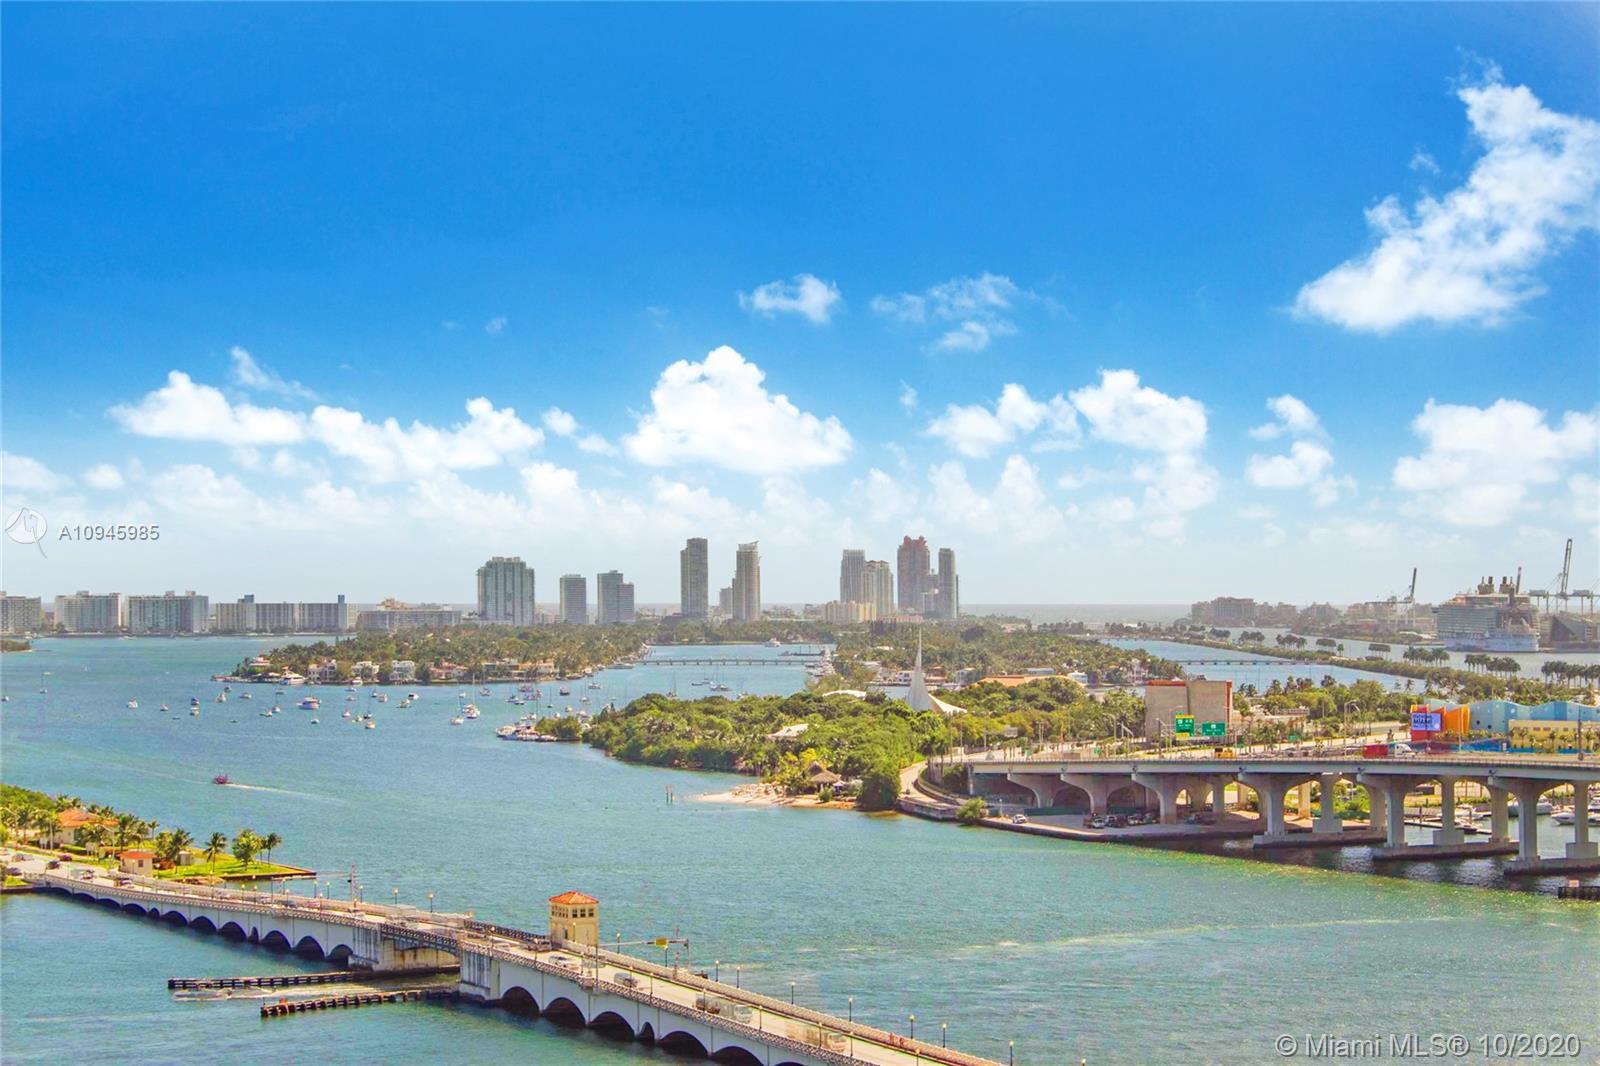 1717 N Bayshore Dr # 2341, Miami, Florida 33132, 3 Bedrooms Bedrooms, ,2 BathroomsBathrooms,Residential,For Sale,1717 N Bayshore Dr # 2341,A10945985